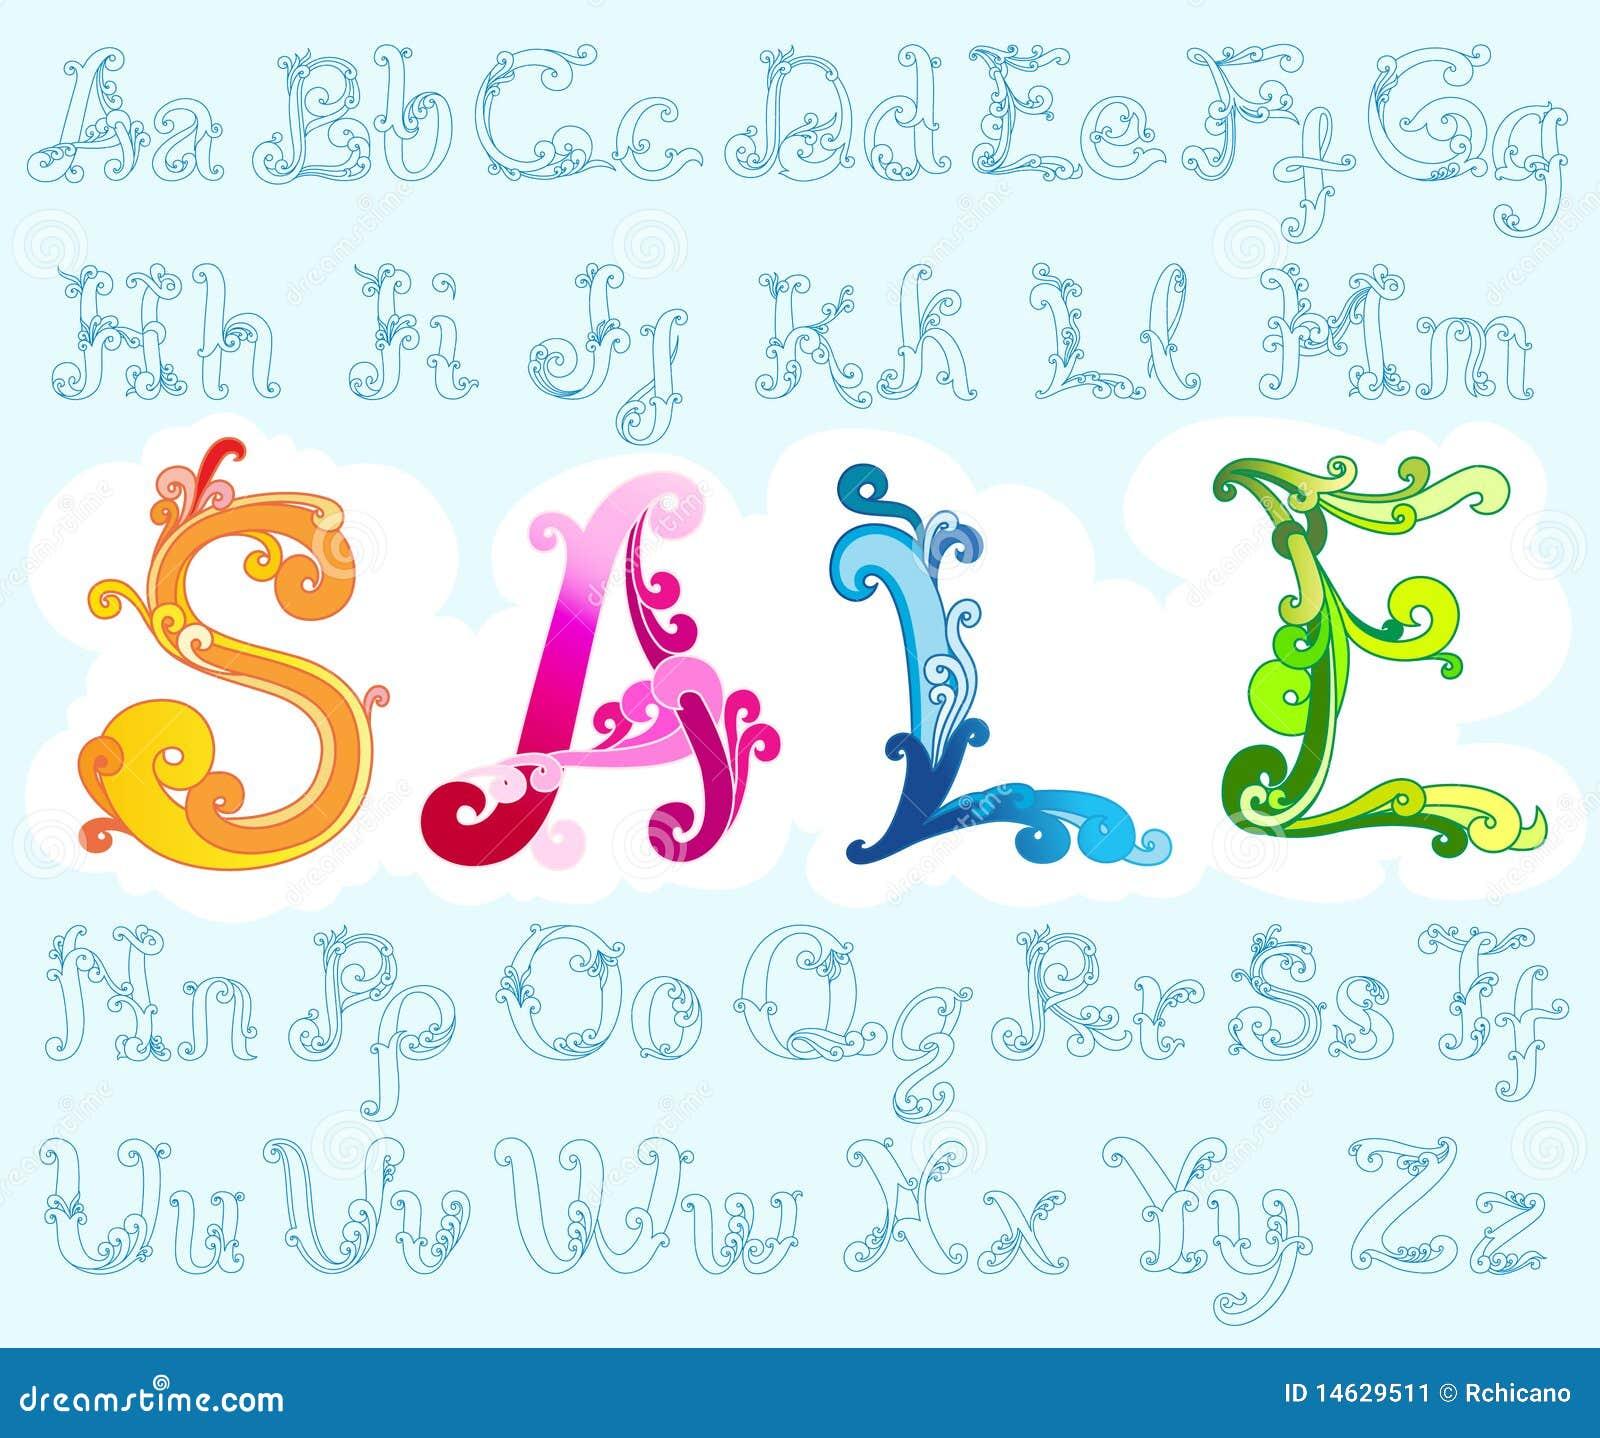 Stylish Retro Font Full Alphabets Stock Vector